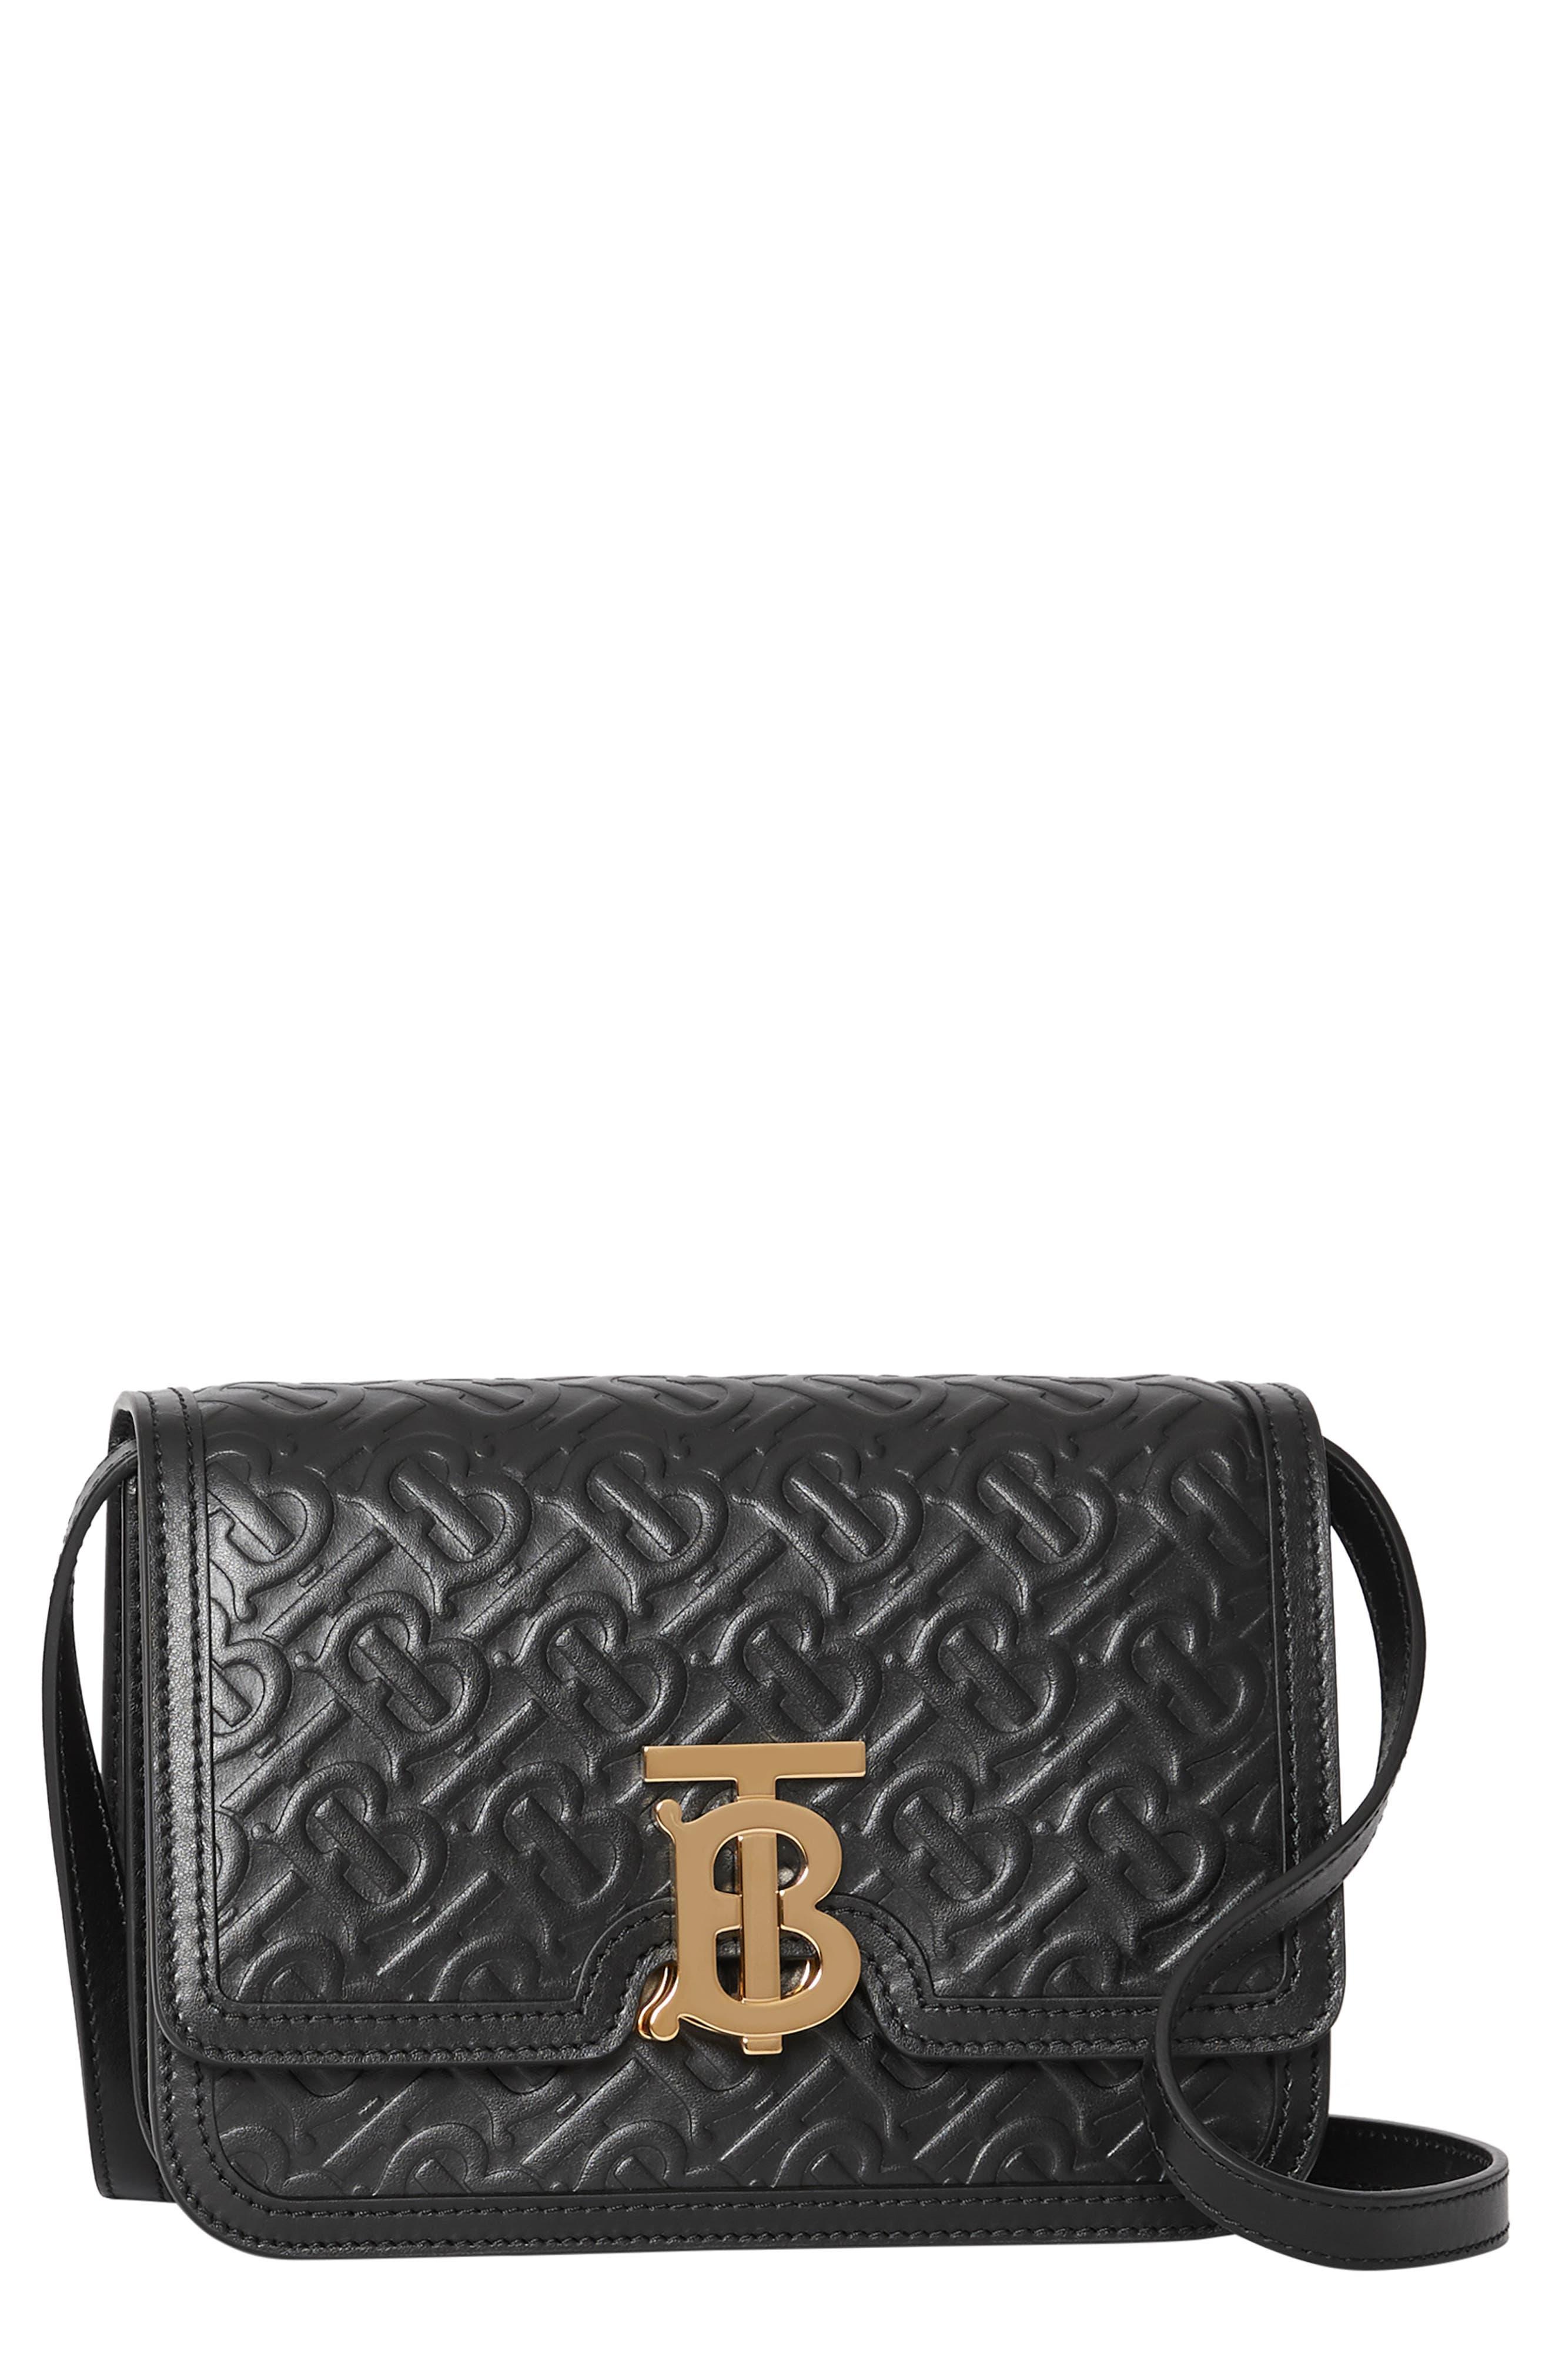 BURBERRY,                             Small Monogram Leather TB Bag,                             Main thumbnail 1, color,                             BLACK